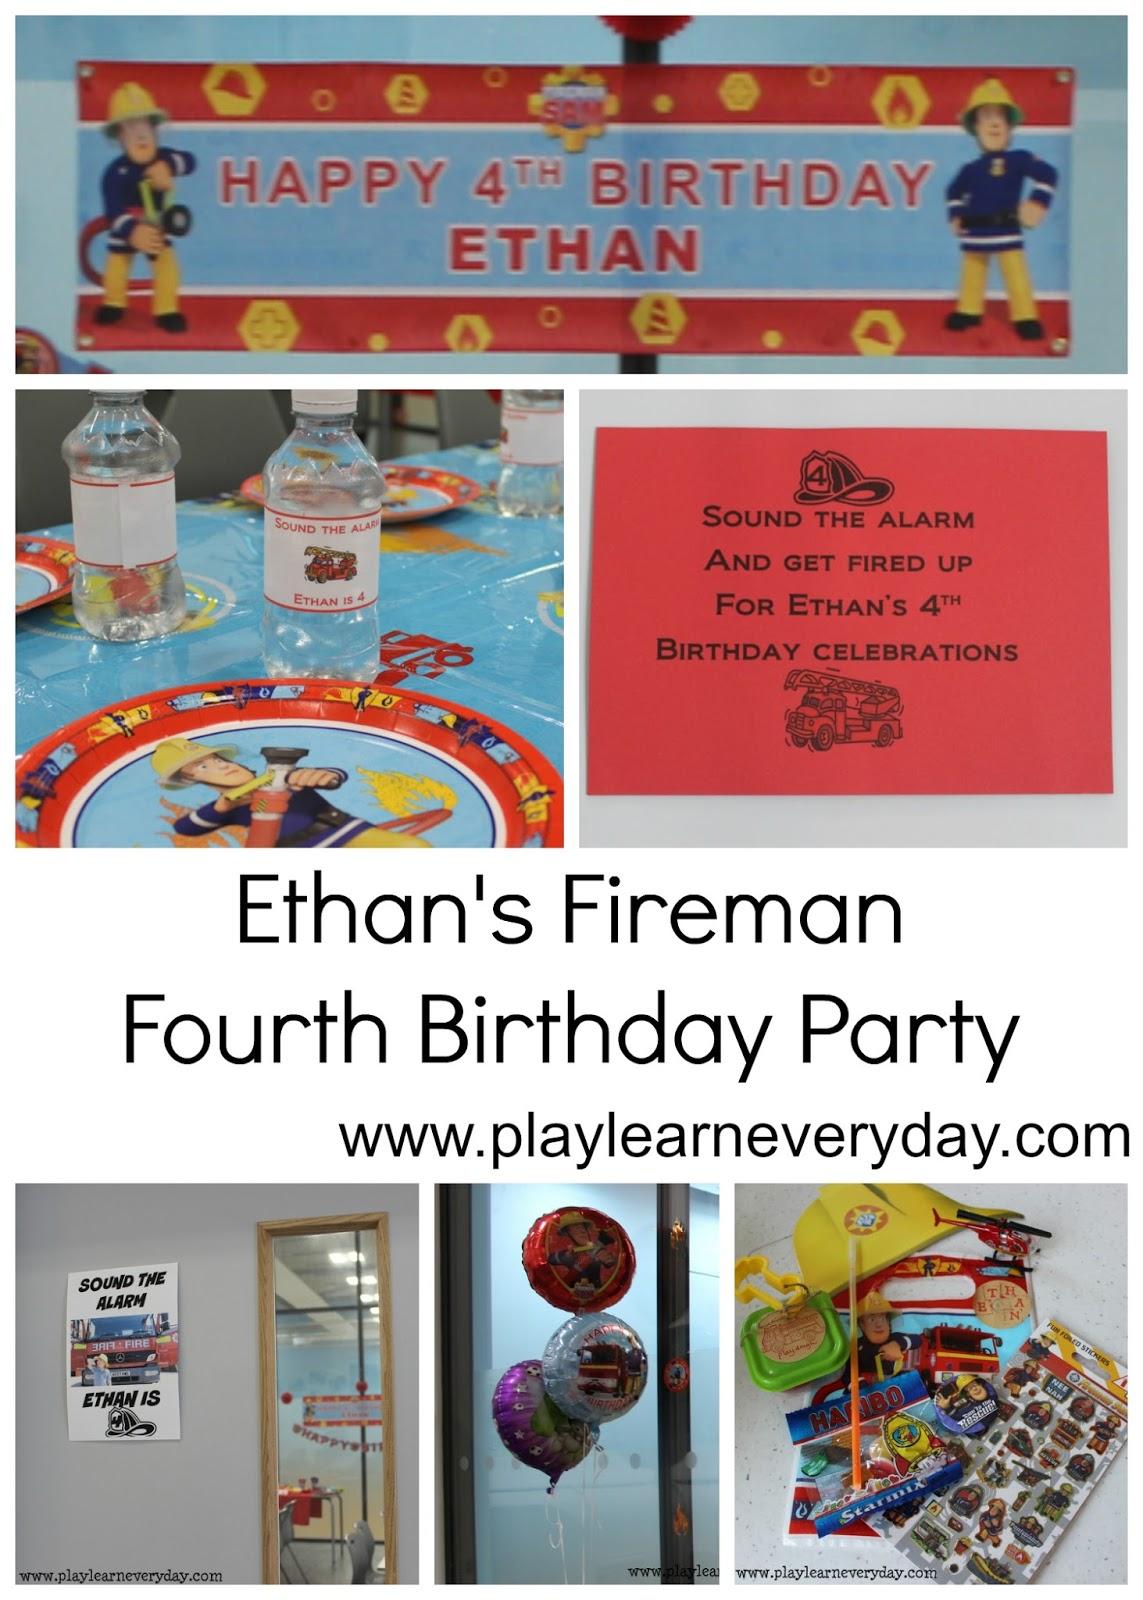 Ethans Fireman Fourth Birthday Party